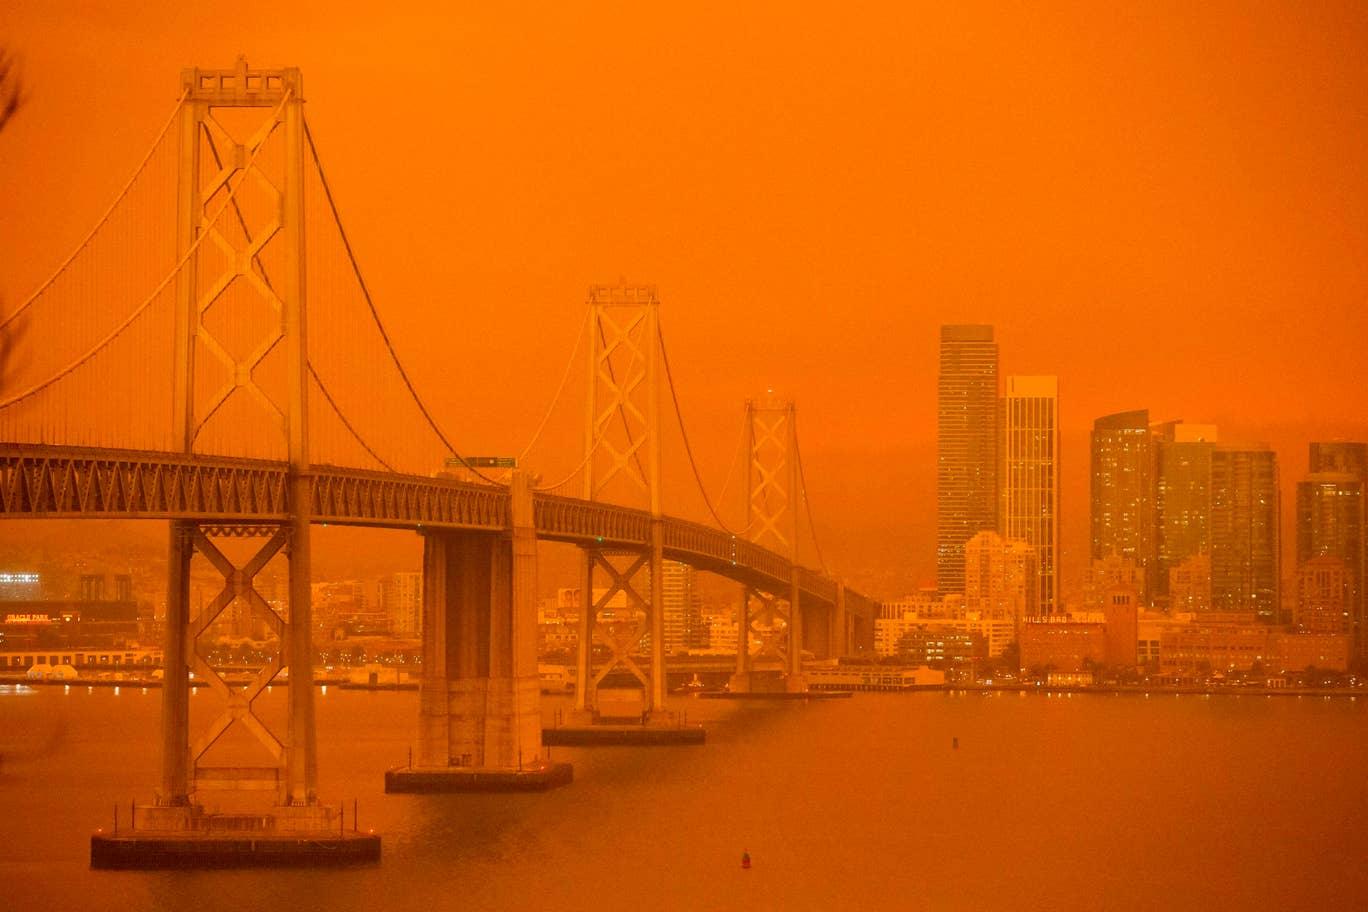 Ominous orange sky gives San Francisco apocalyptic tint